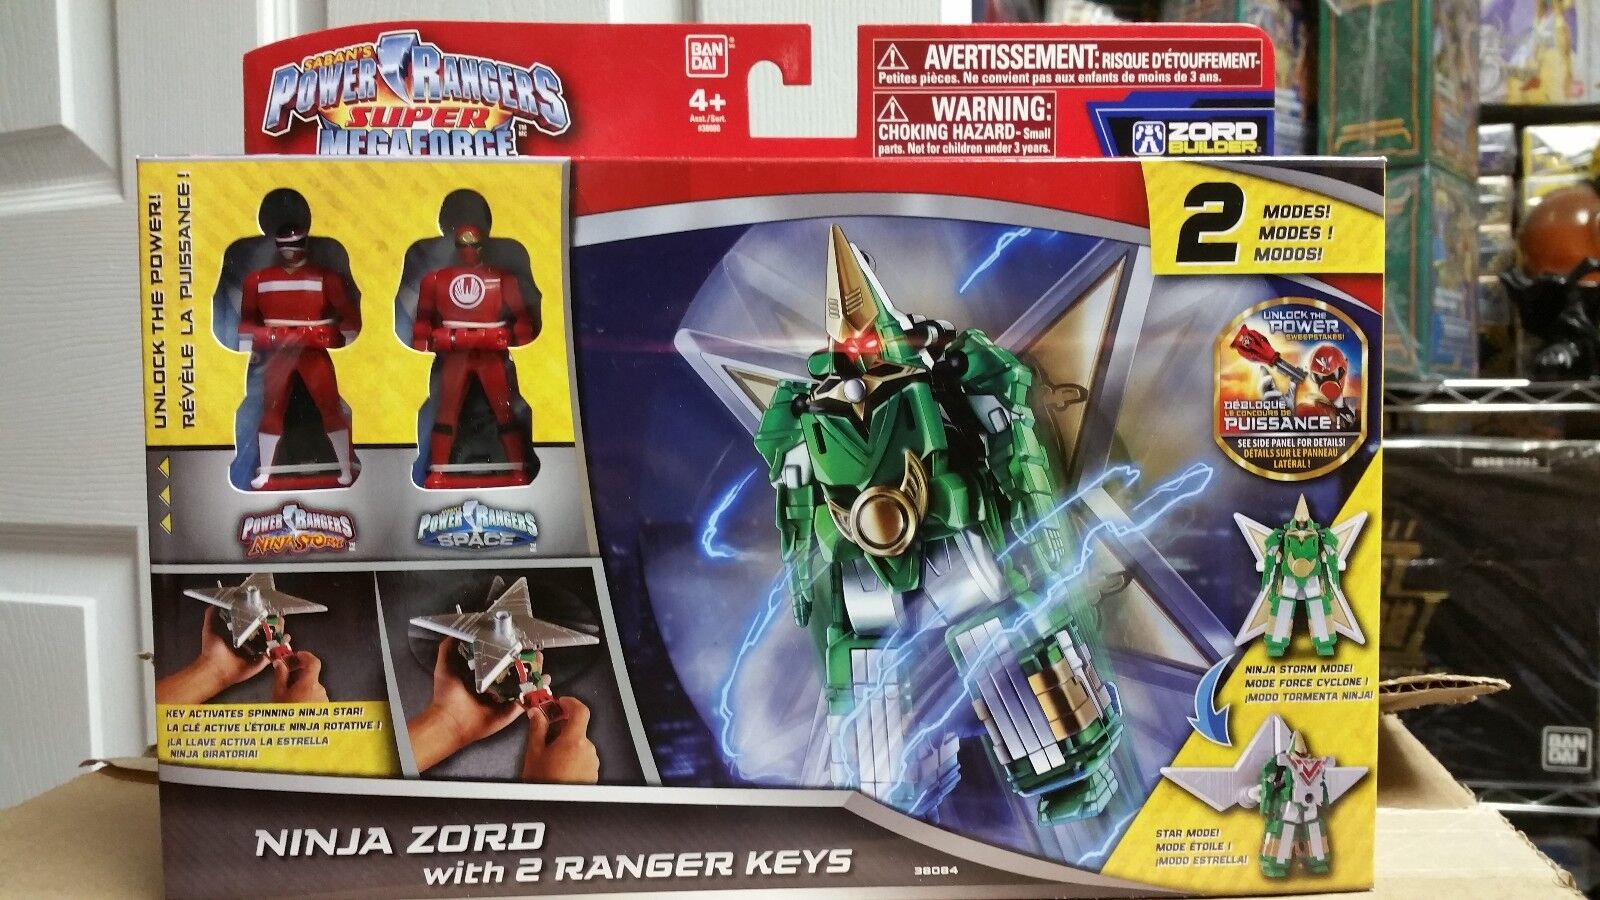 Power rangers super megaforce ninja zord mit 2 rangers schlüssel misb